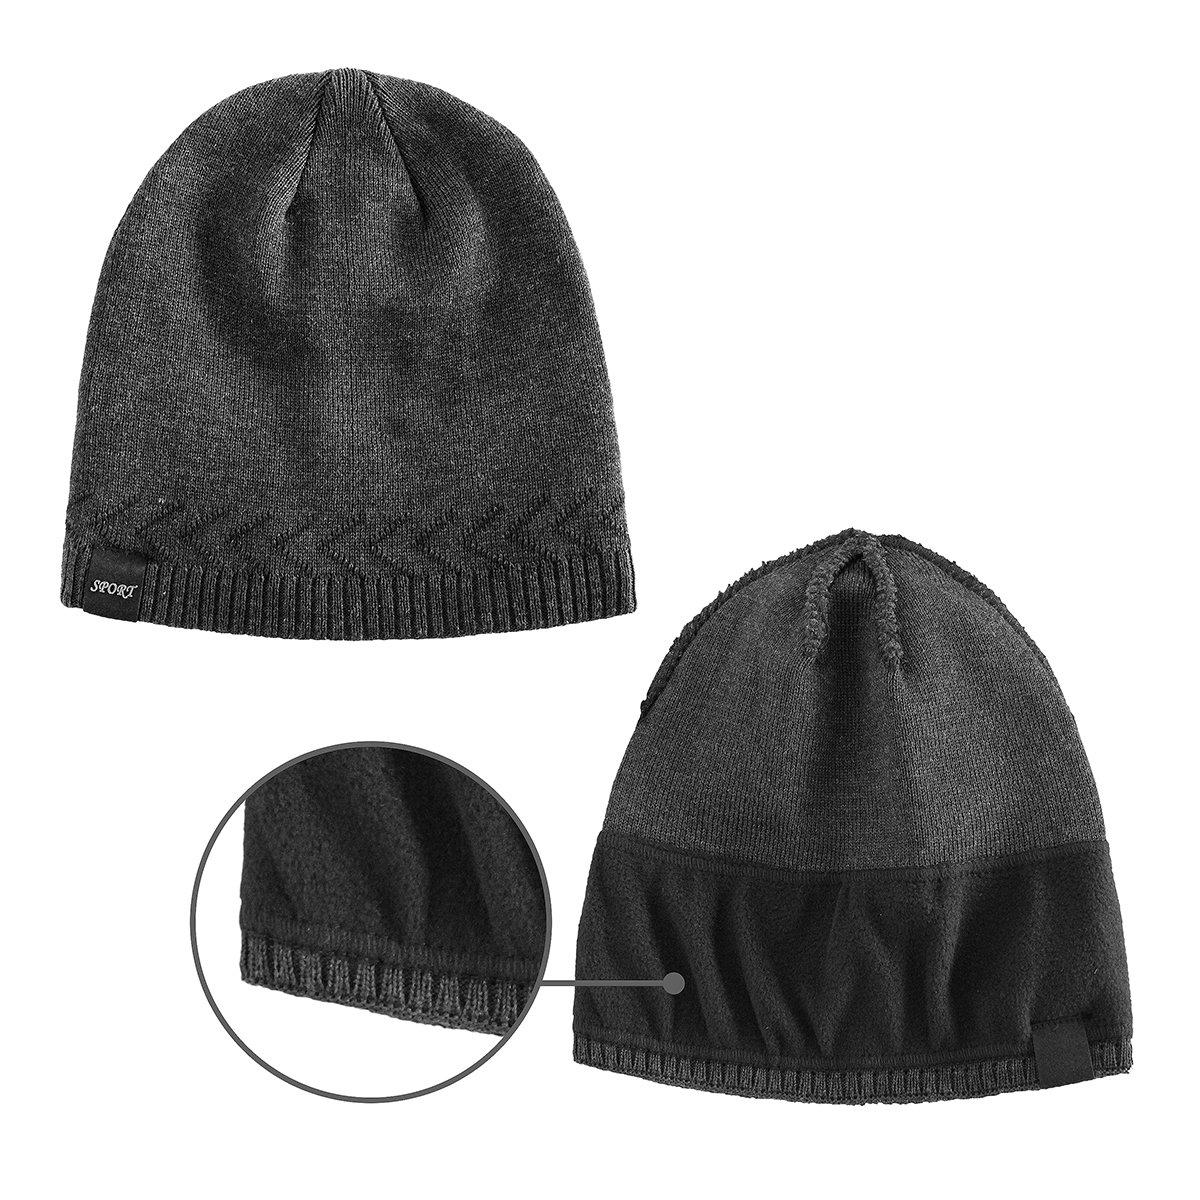 076ed90b612 OMECHY Mens Winter Warm Knitting Hats Plain Skull Beanie Cuff Toboggan Knit  Cap 4 Colors Black larger image